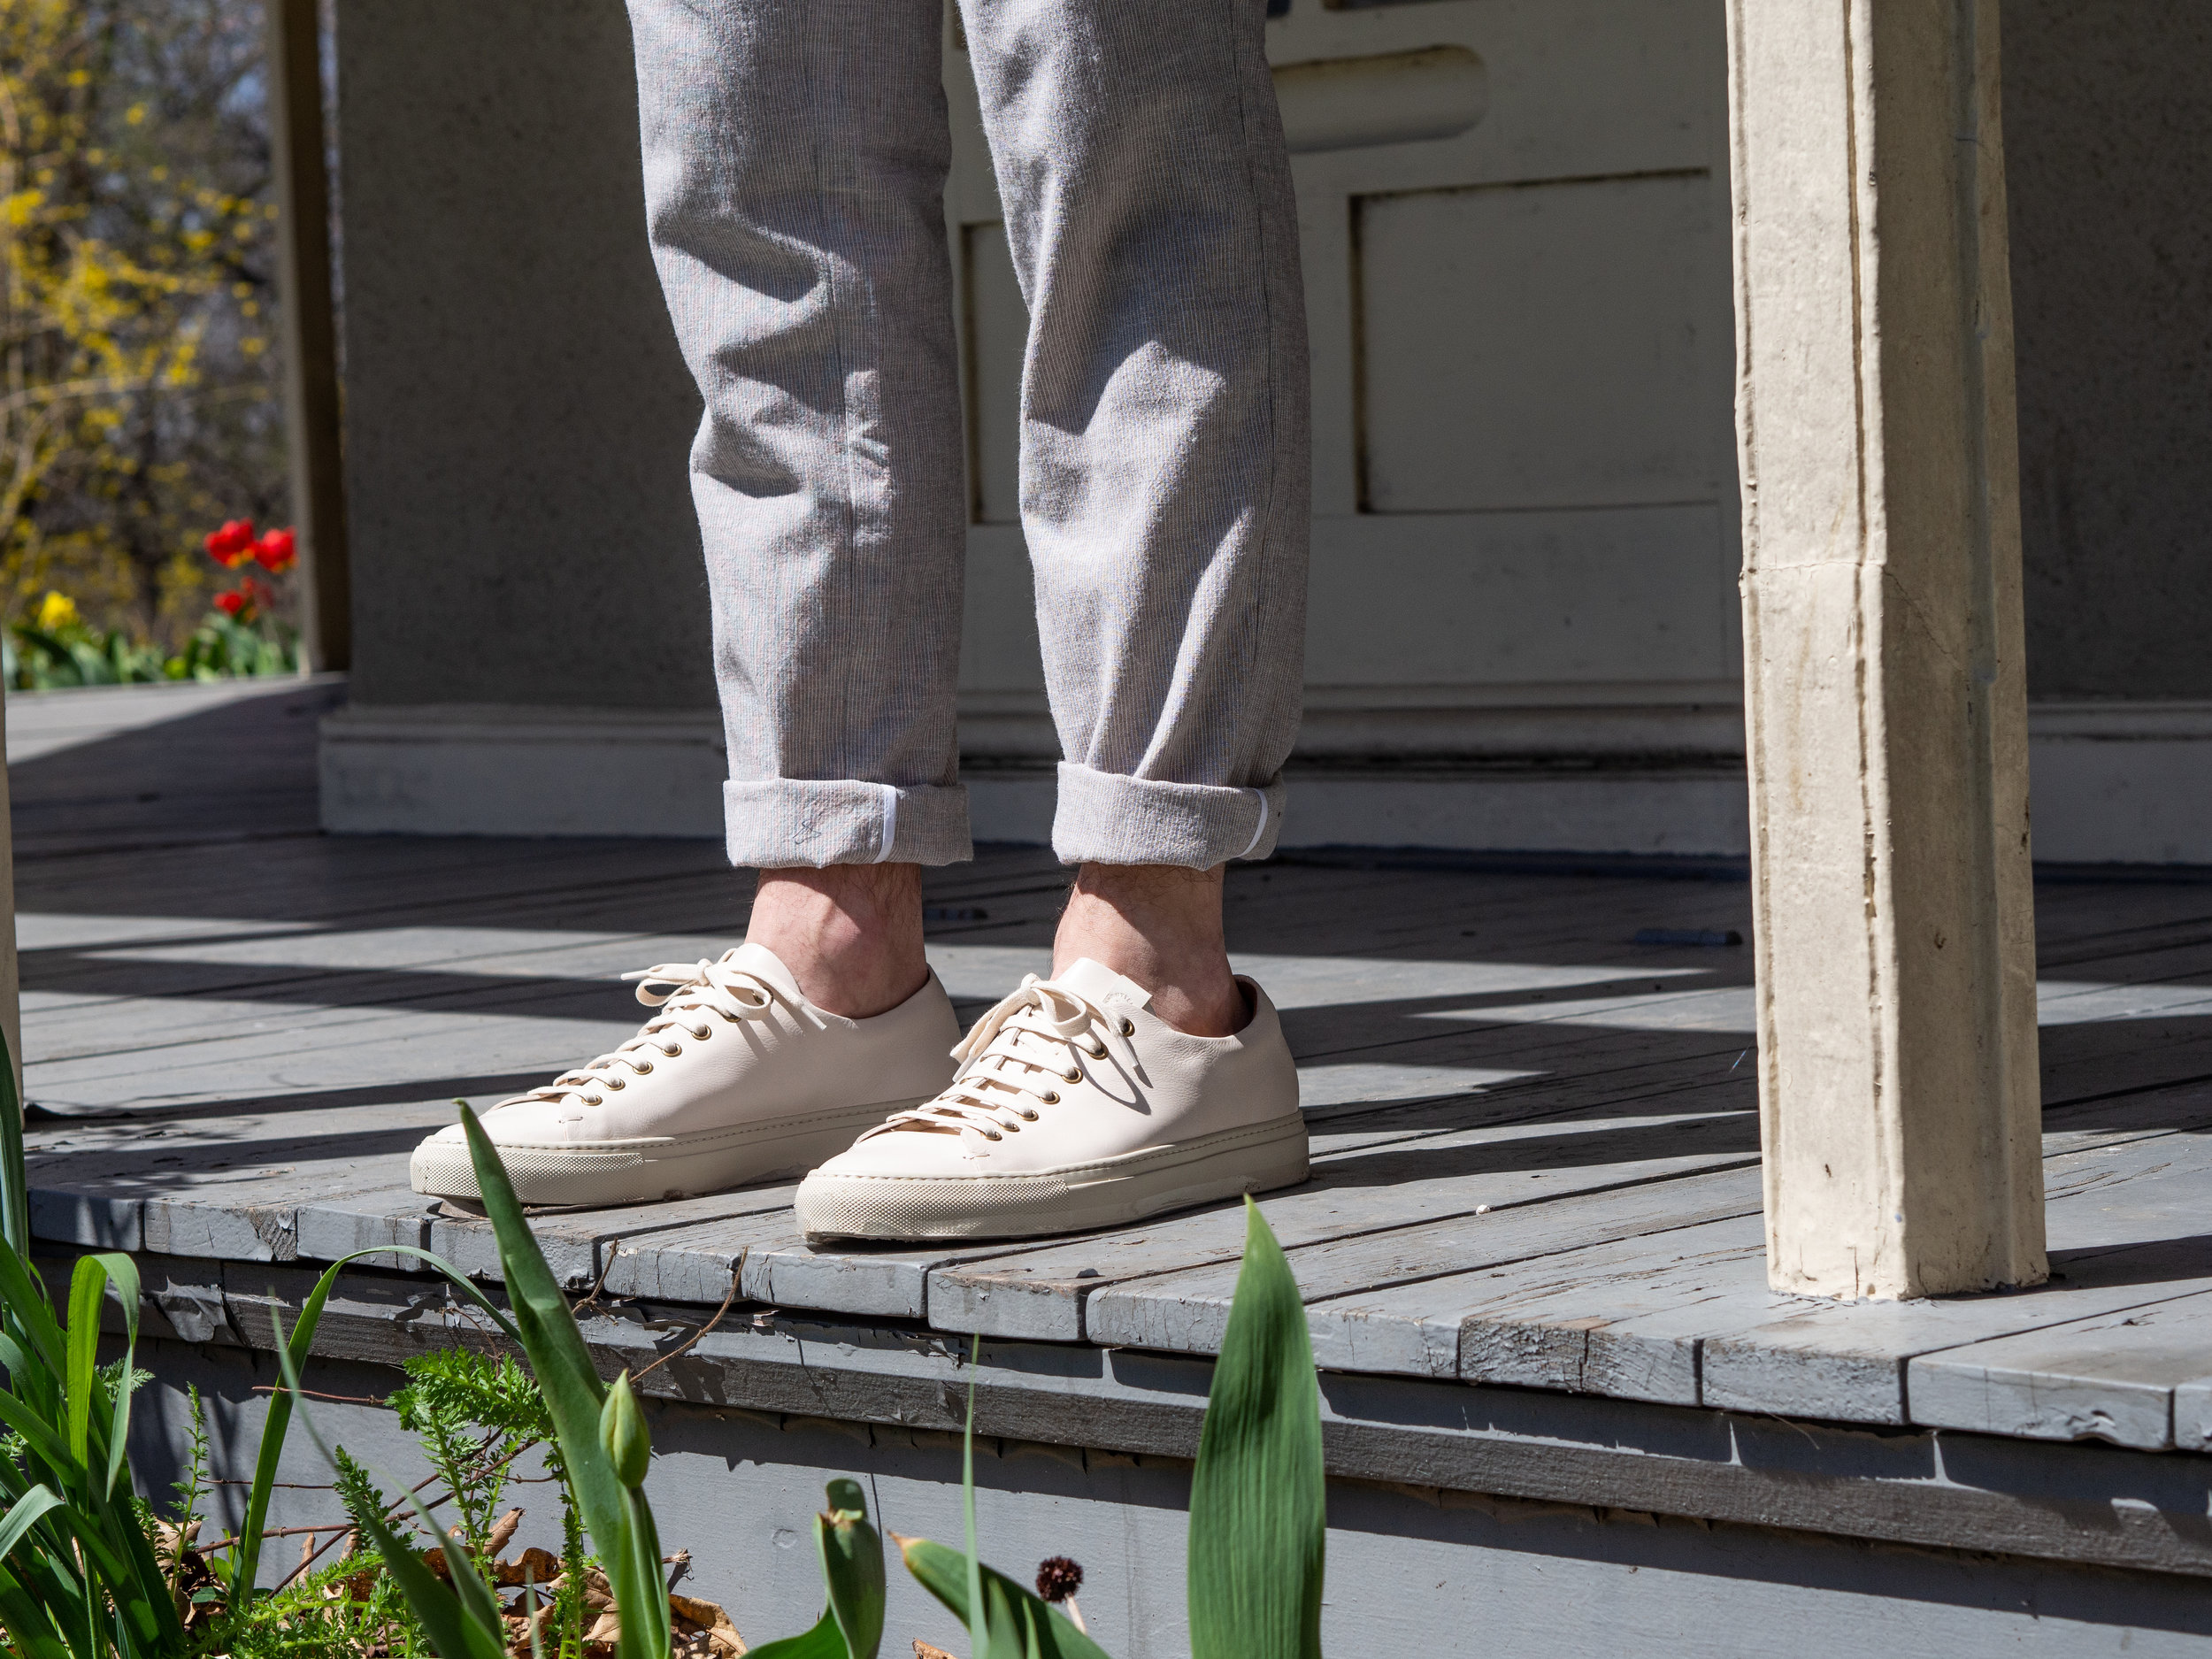 013    18 Waits  Linen Blazer ,  Trousers  &  Shirt     Buttero  Sneakers